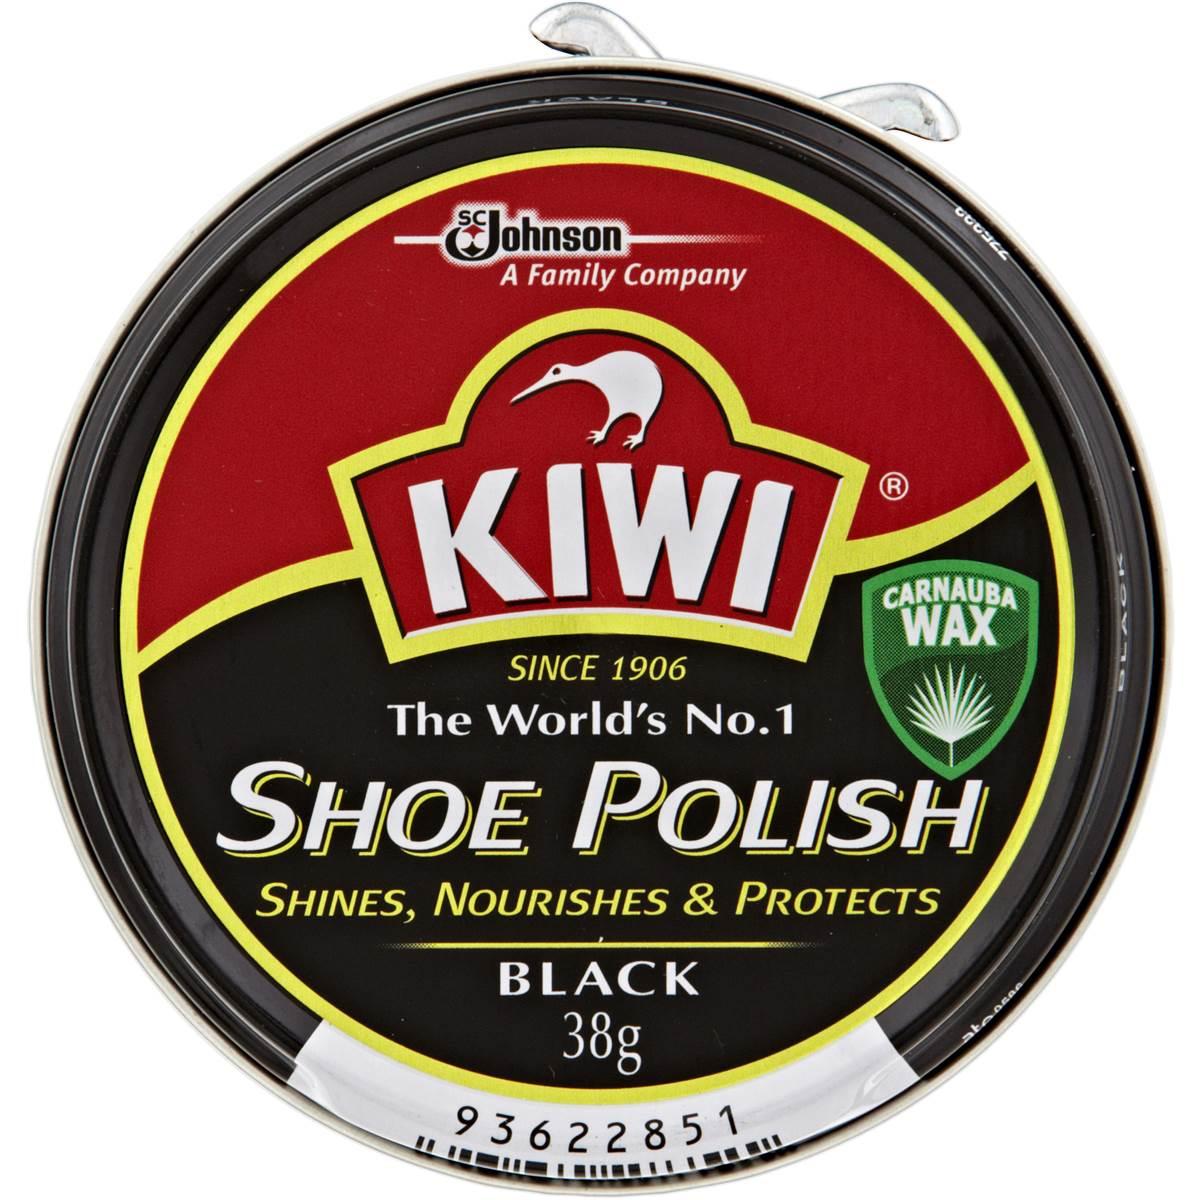 Kiwi Shoe Care Polish Black 38g | Woolworths